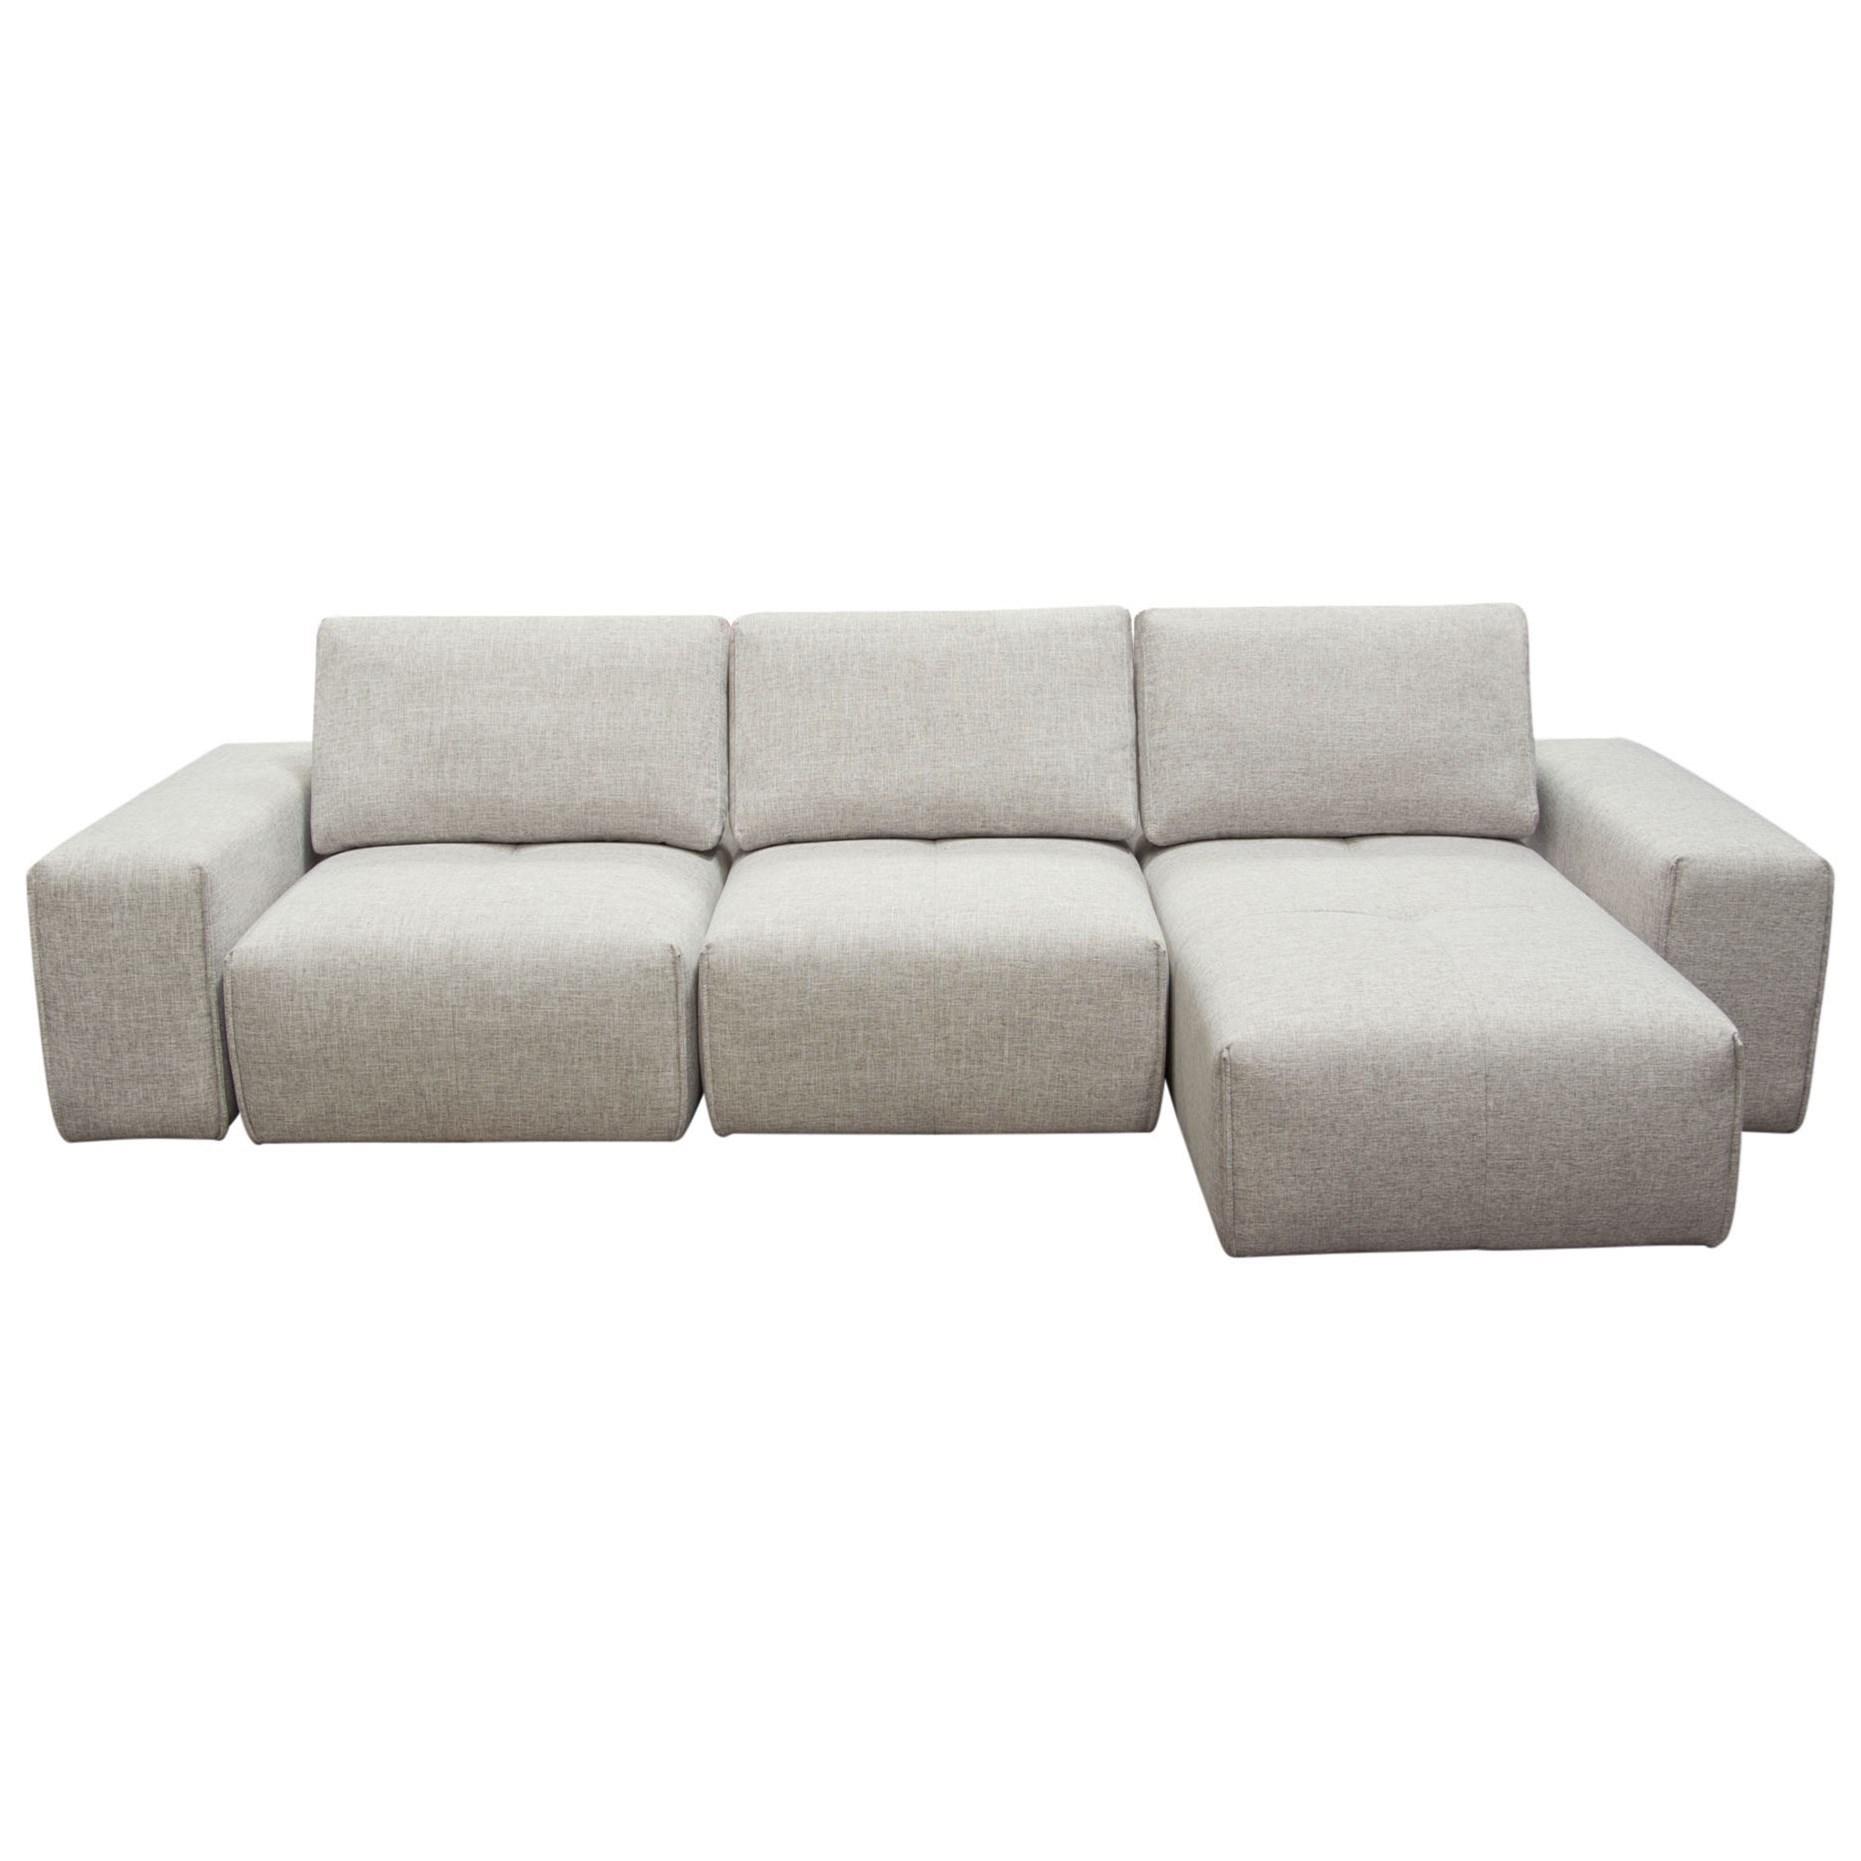 Jazz Sectional by Diamond Sofa at HomeWorld Furniture